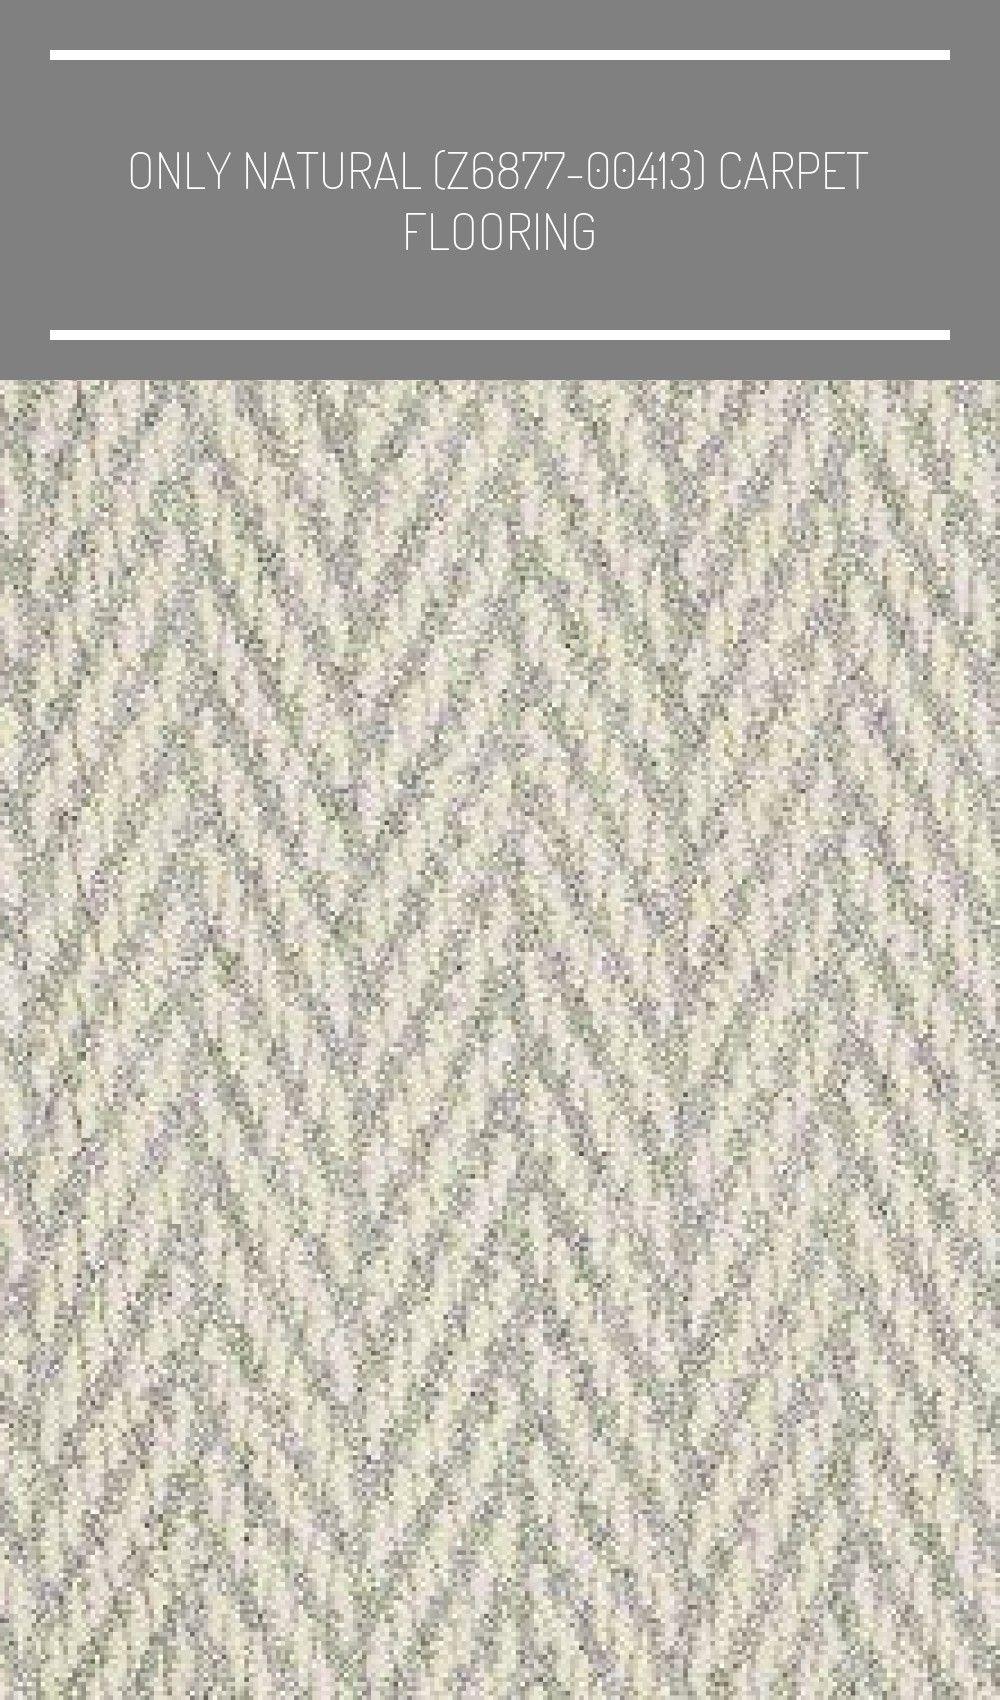 Berber Carpet Bedroom Wall Colors Only Natural Z6877 00413 Carpet Flooring Anderson Tuftex In 2020 Bedroom Carpet Carpet Flooring Bedroom Wall Colors